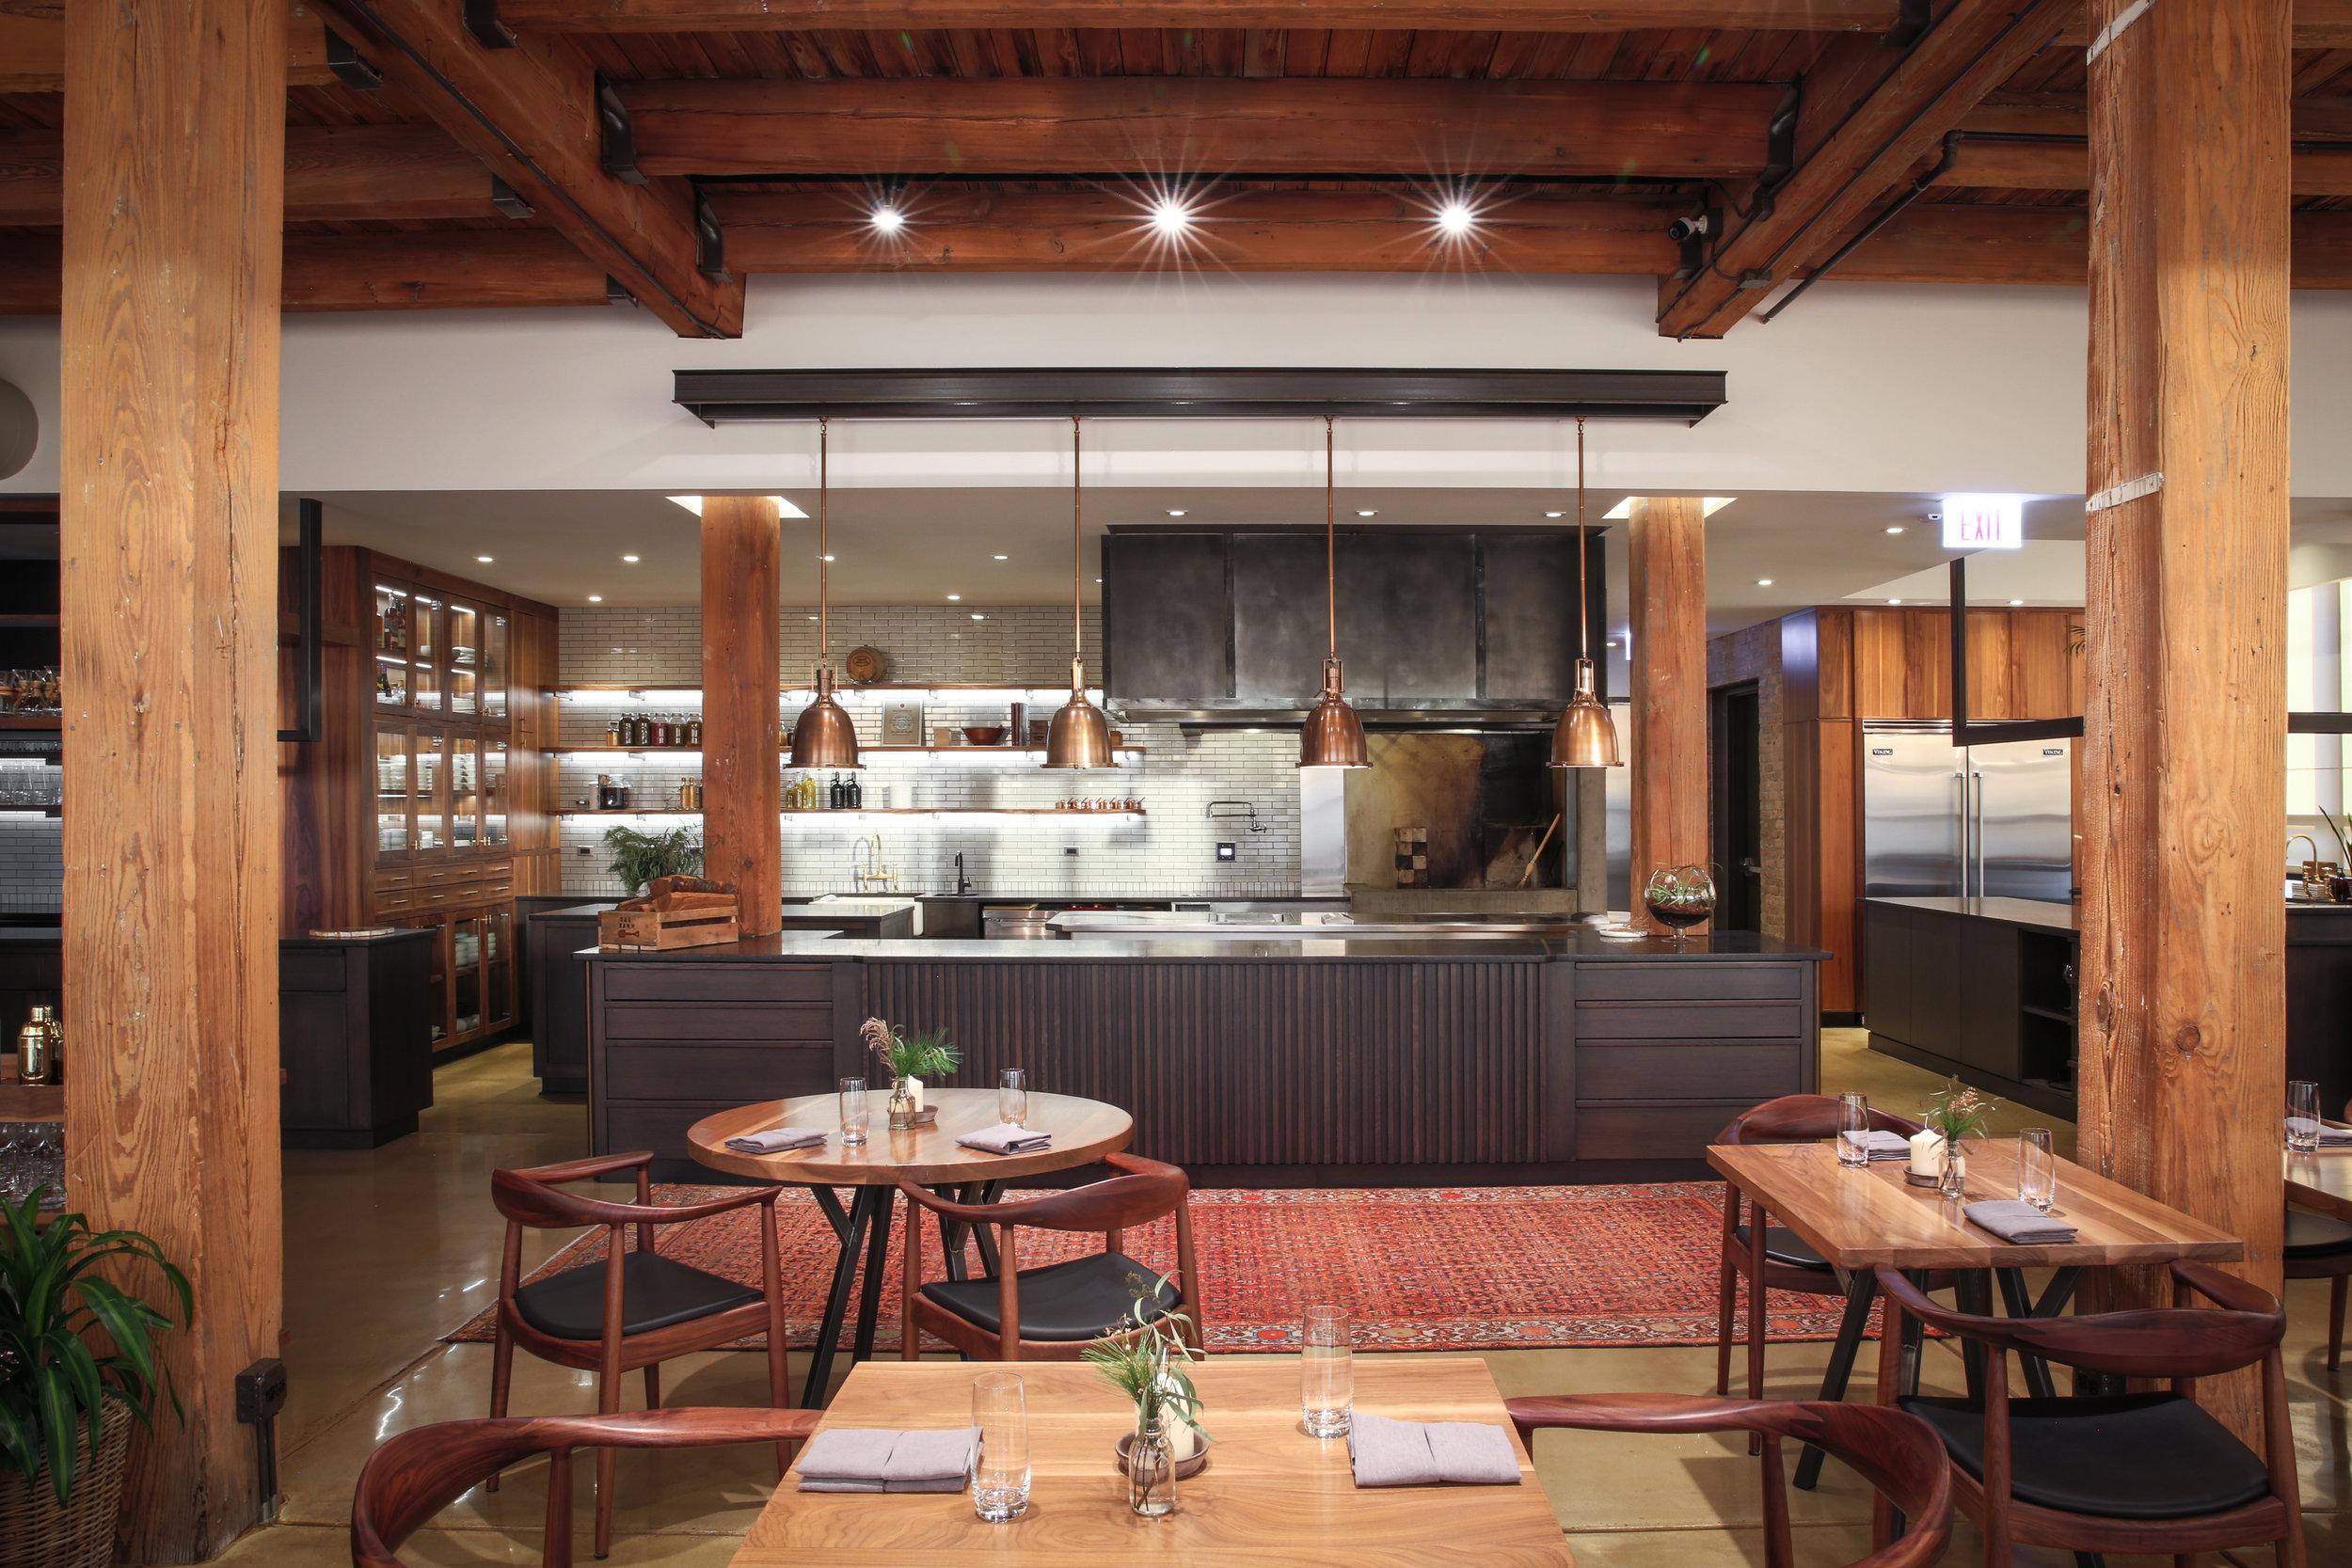 studio-saint-bars-and-restaurants-smyth-and-the-loyalist-washington-dc-9